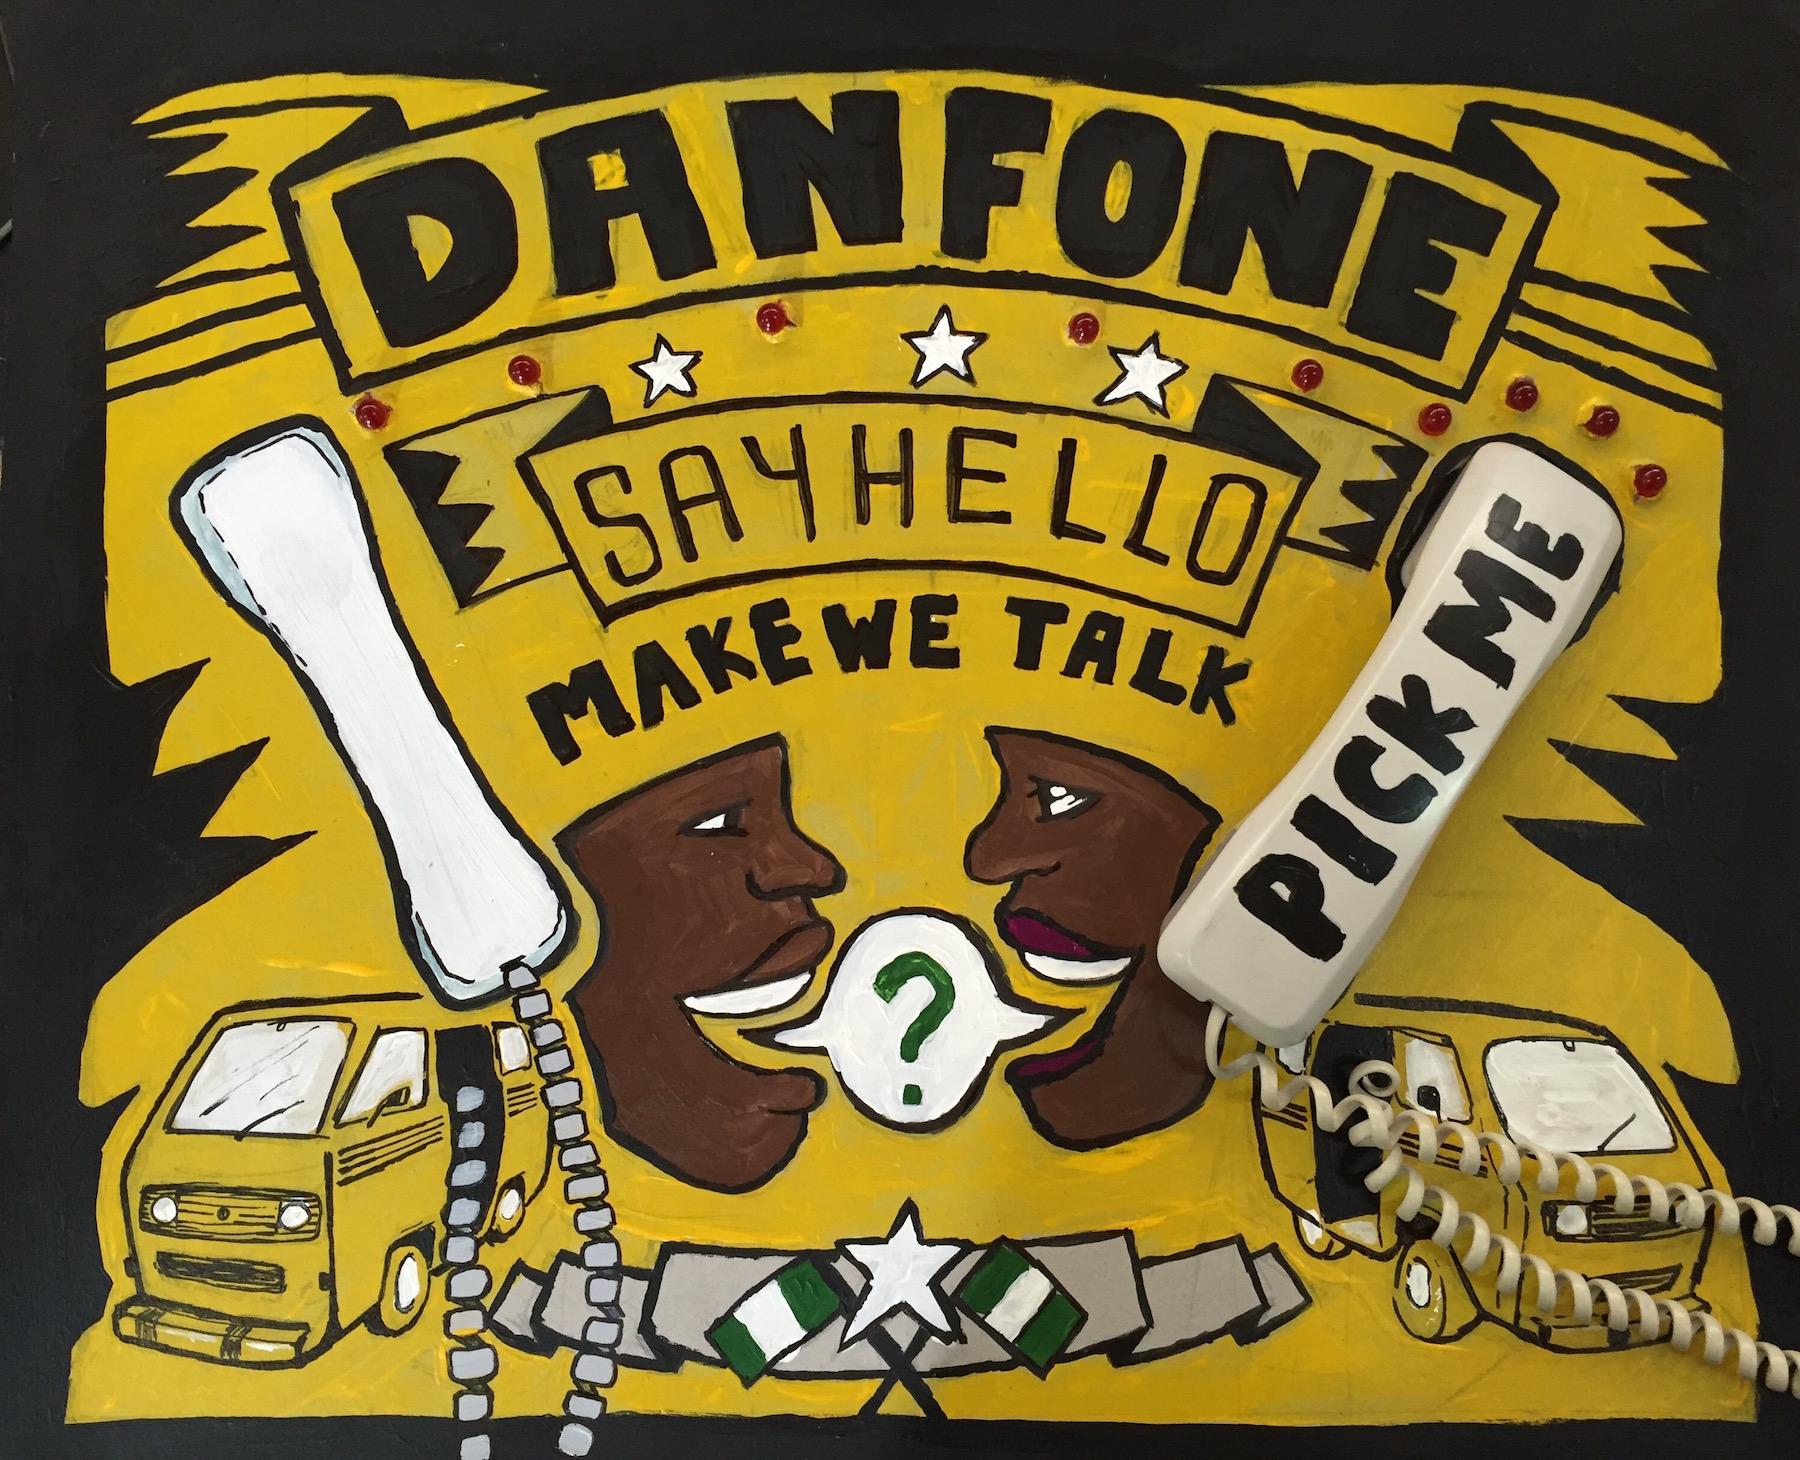 Danfone